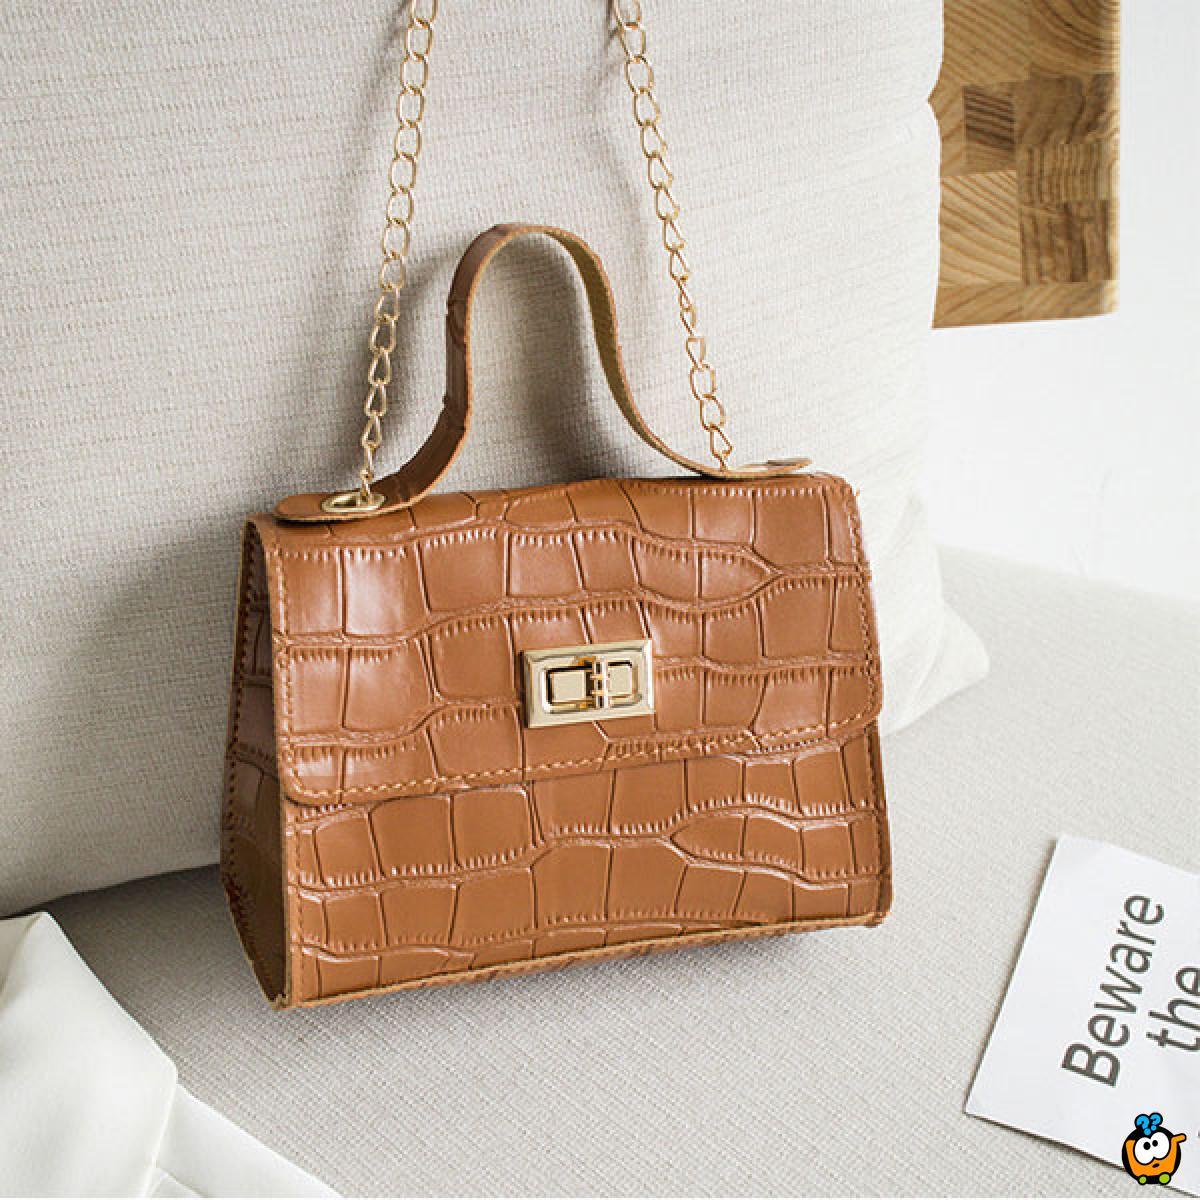 Elegantna kroko torbica sa lancem